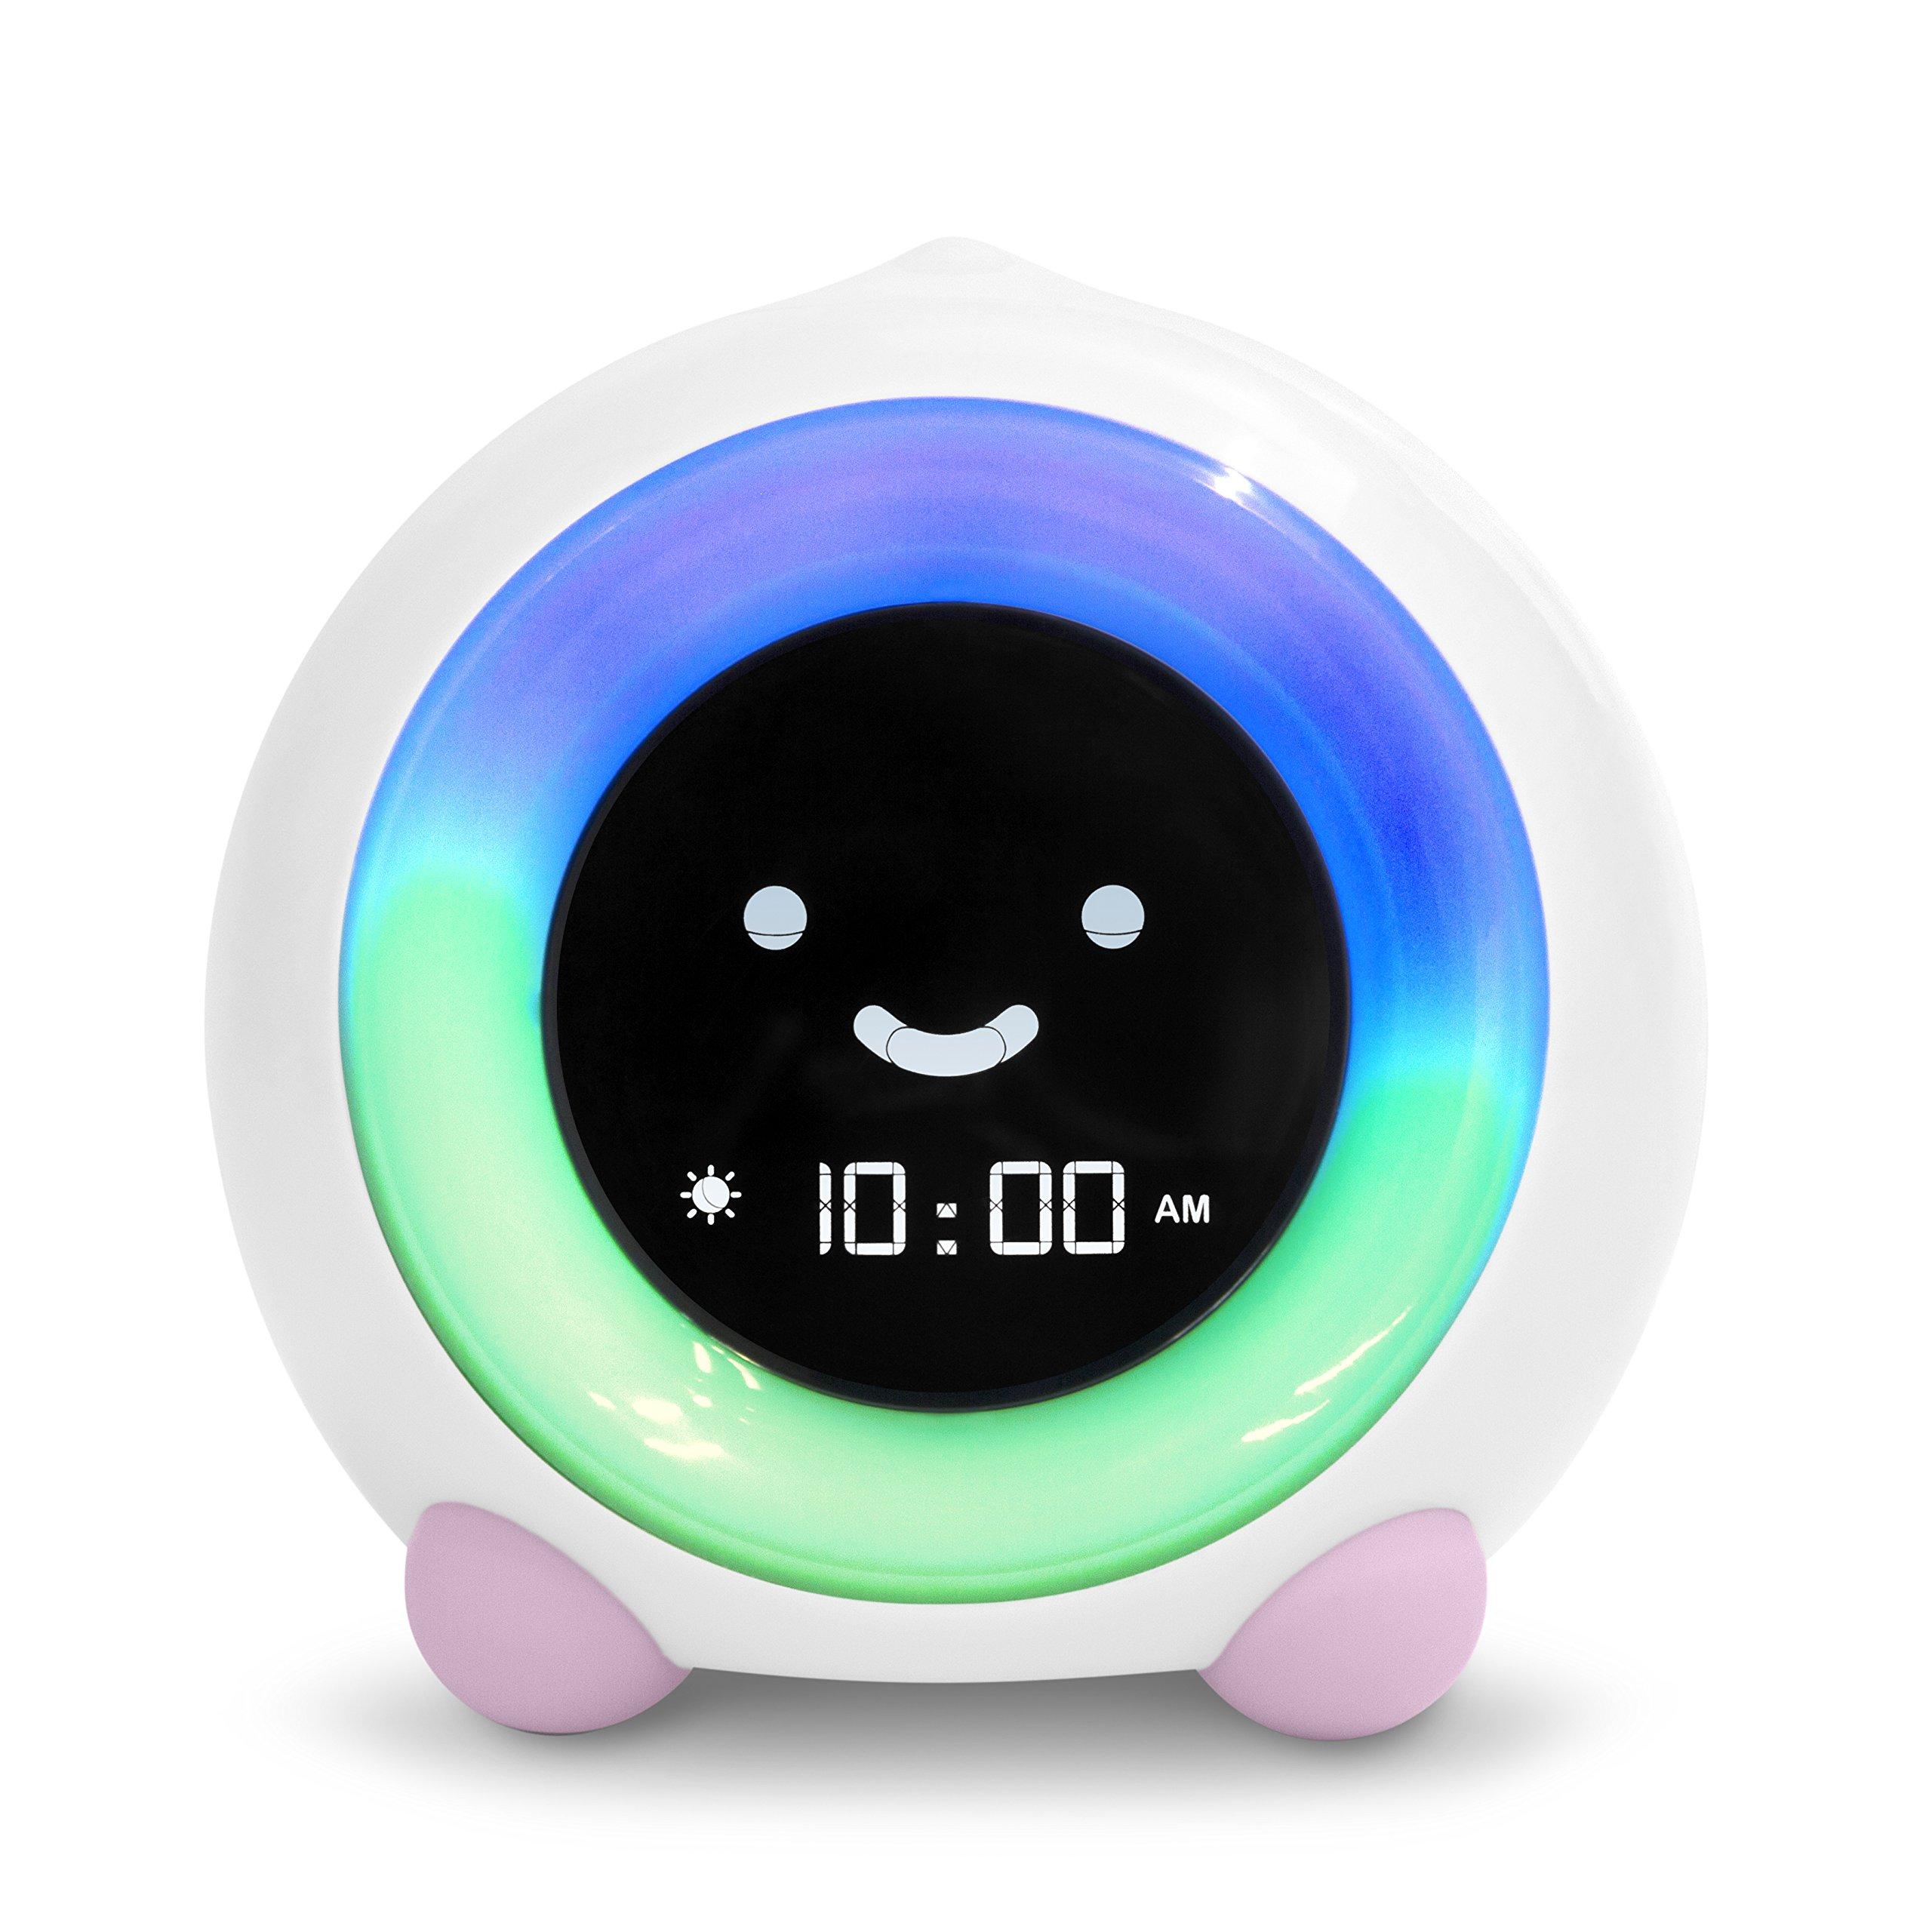 LittleHippo Mella Ready to Rise Children's Sleep Trainer, Alarm Clock, Night Light Sleep Sounds Machine (Blush Pink)